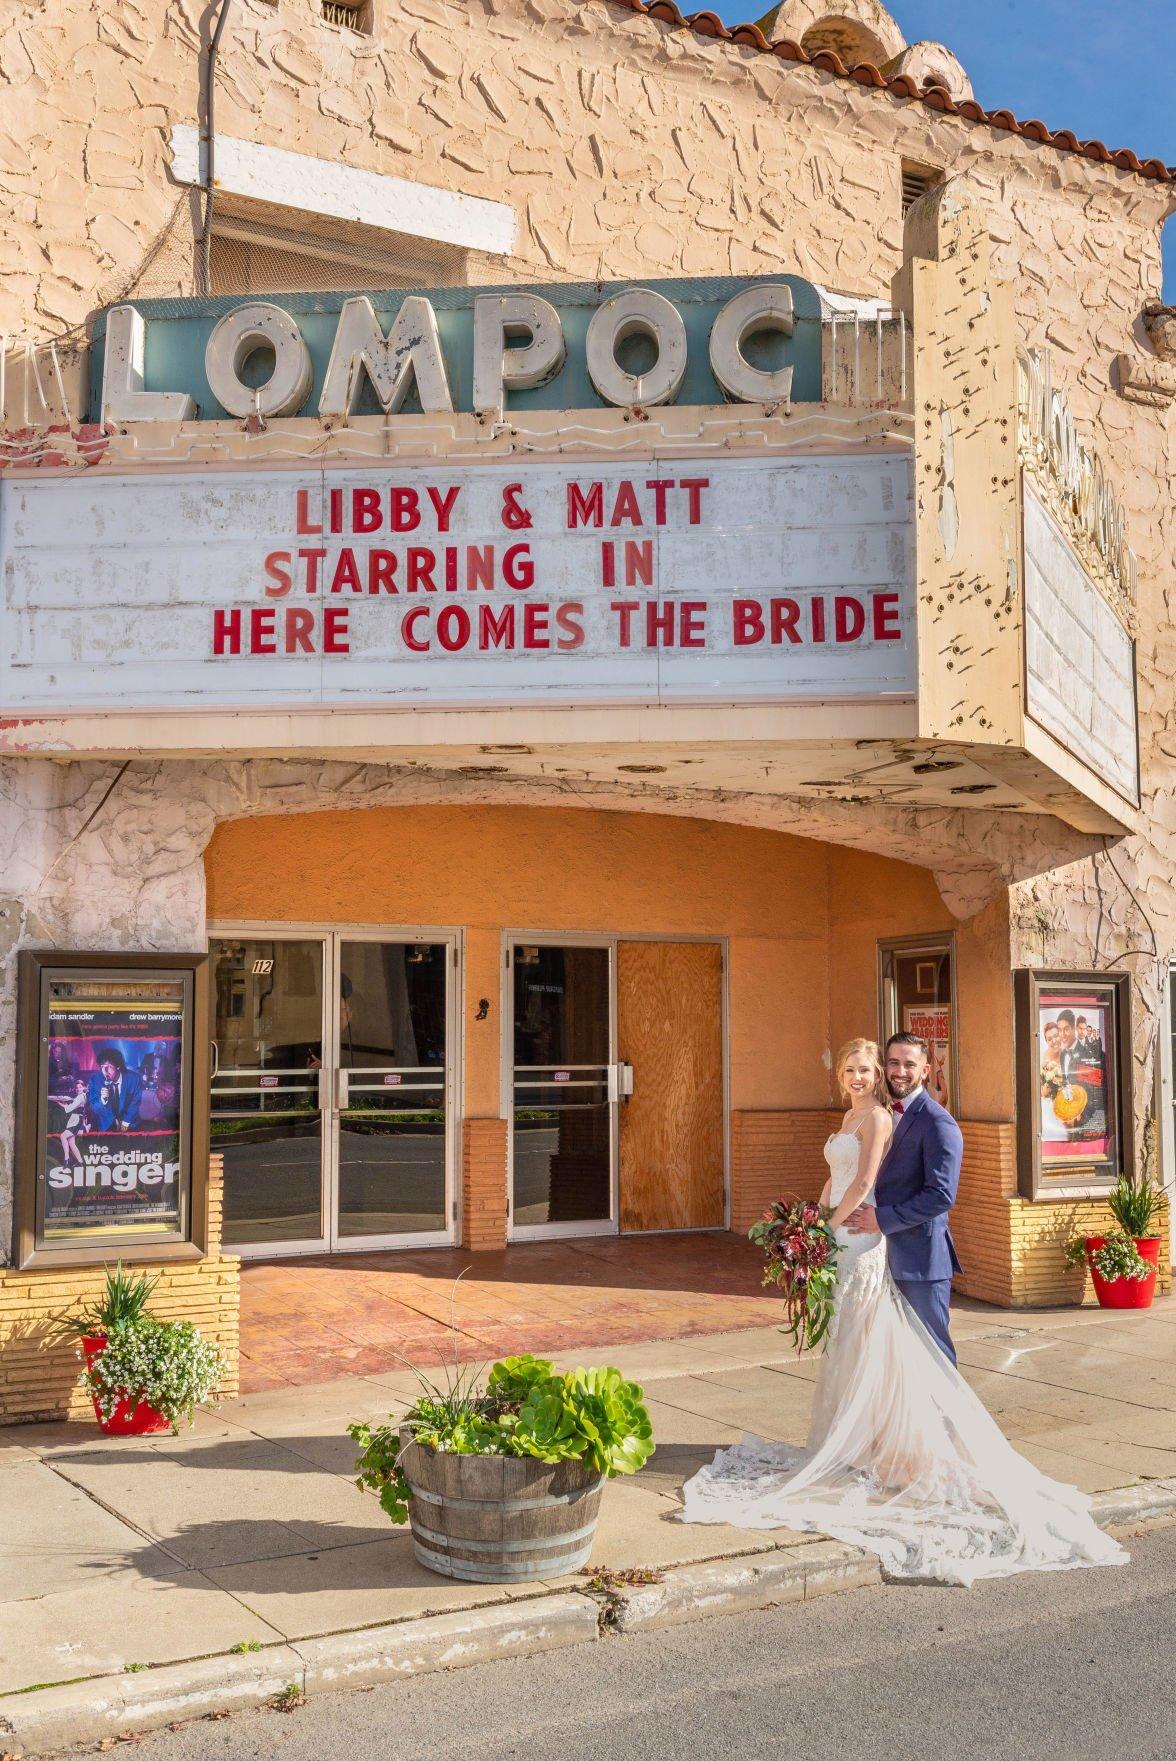 011919 Lompoc Theatre wedding 02.jpg